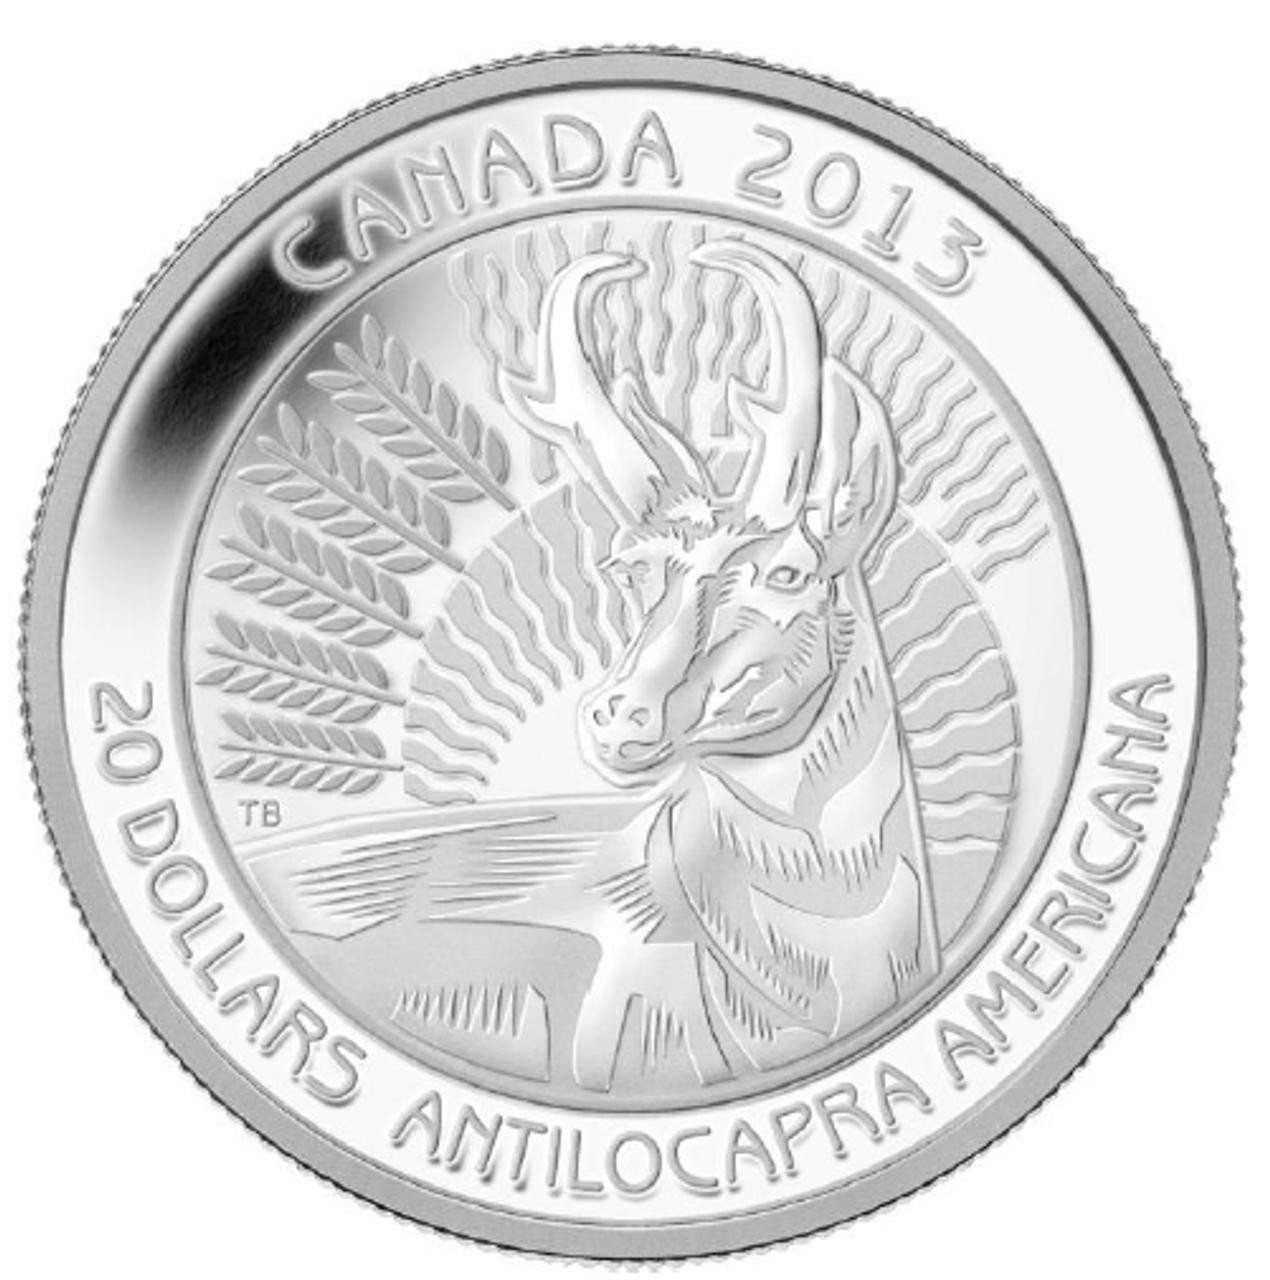 Canada 2013 $20 Pure Silver 300th Anniversary of Louisbourg Coin Sale